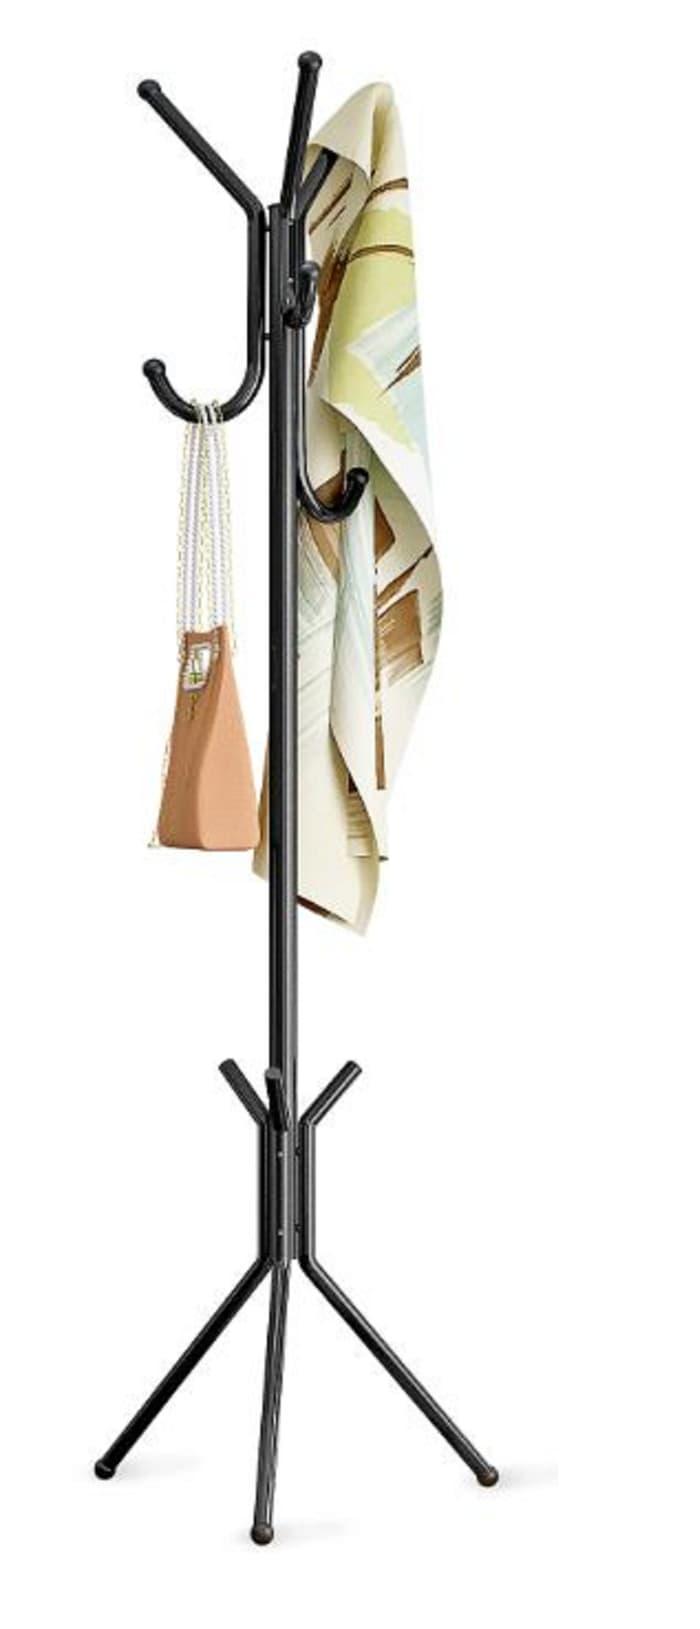 Geboyshopp Standing Hanger Multifunction